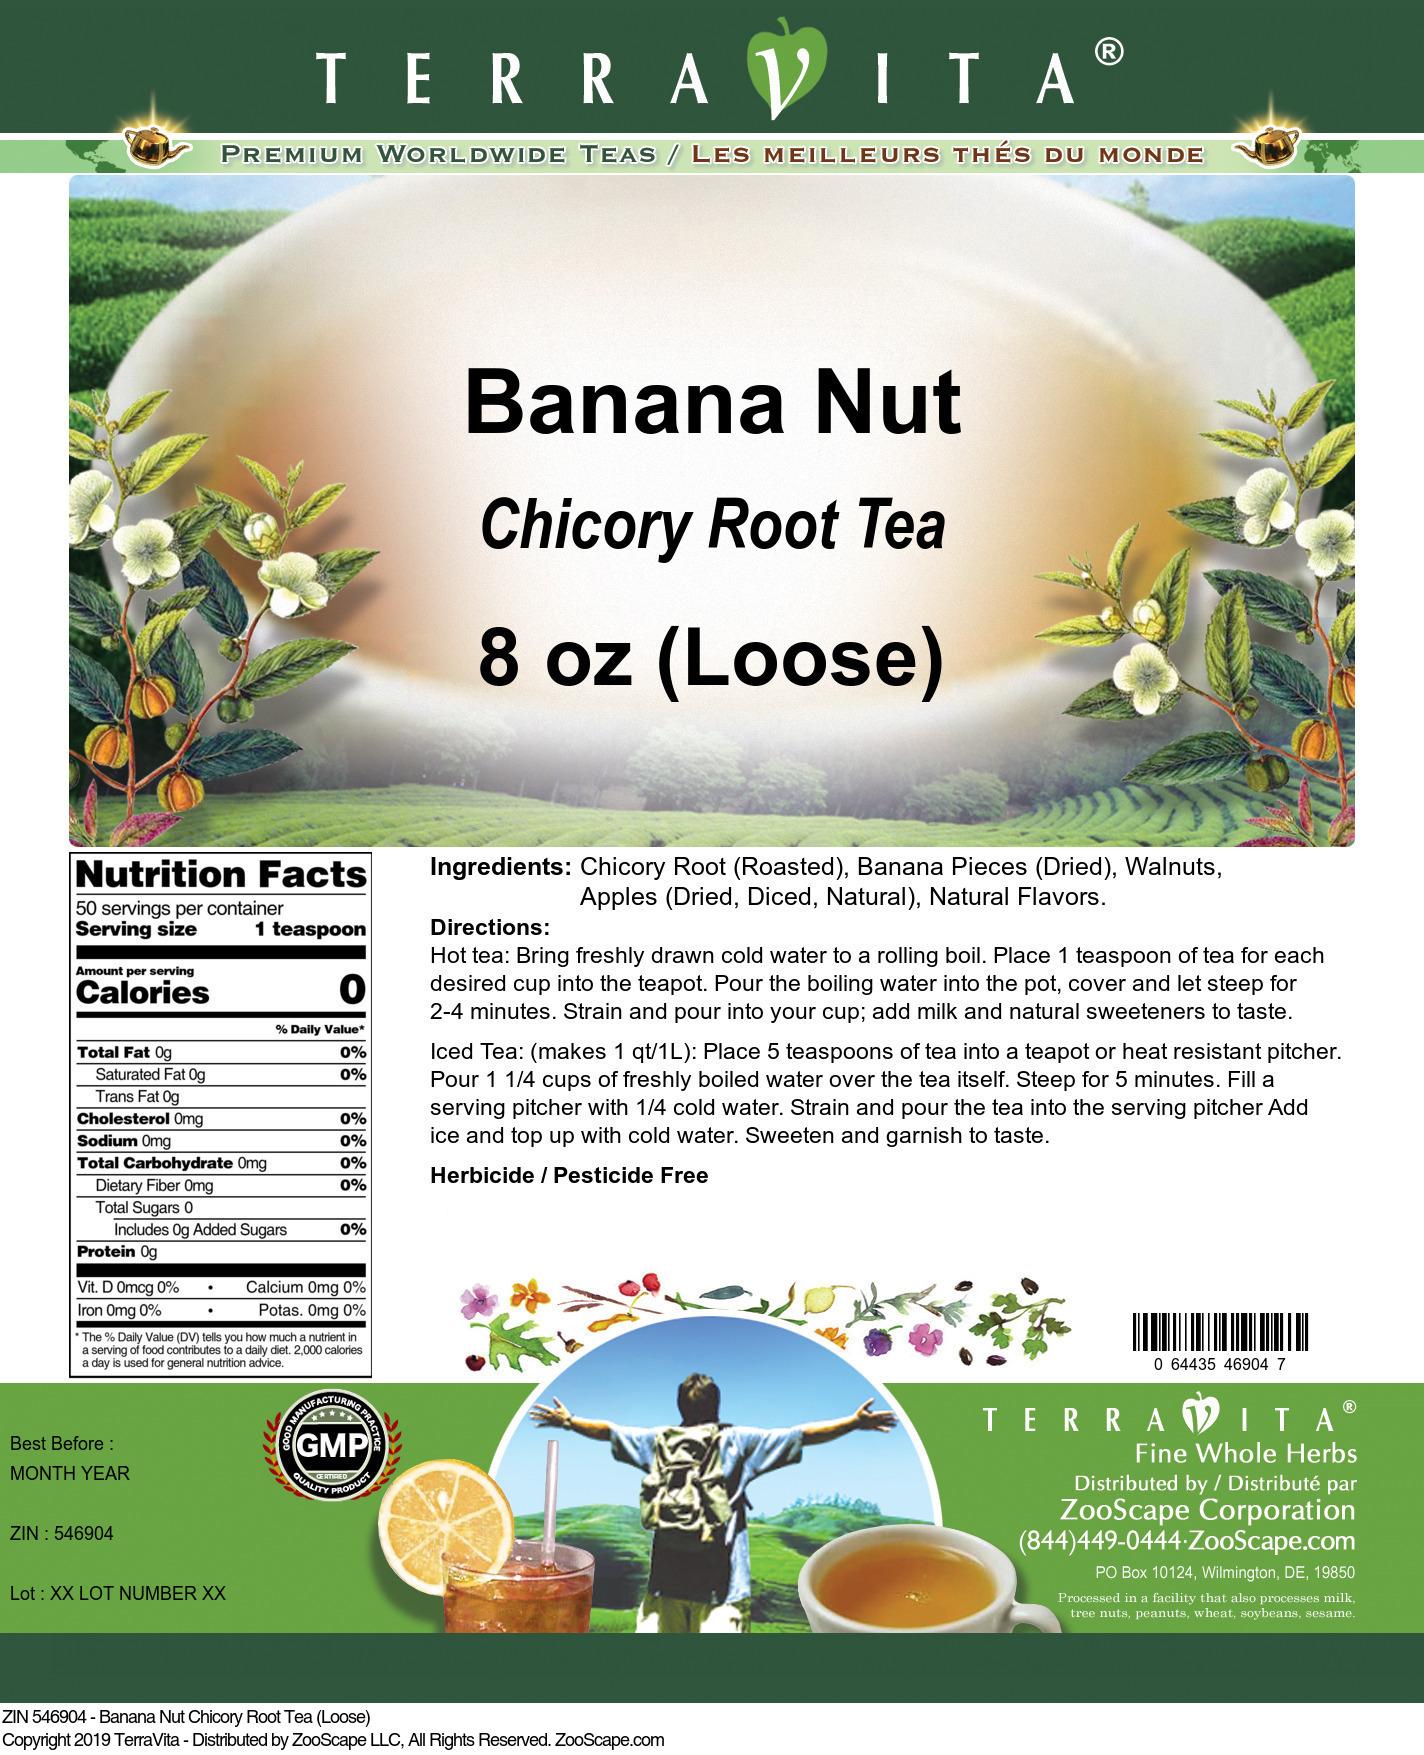 Banana Nut Chicory Root Tea (Loose)